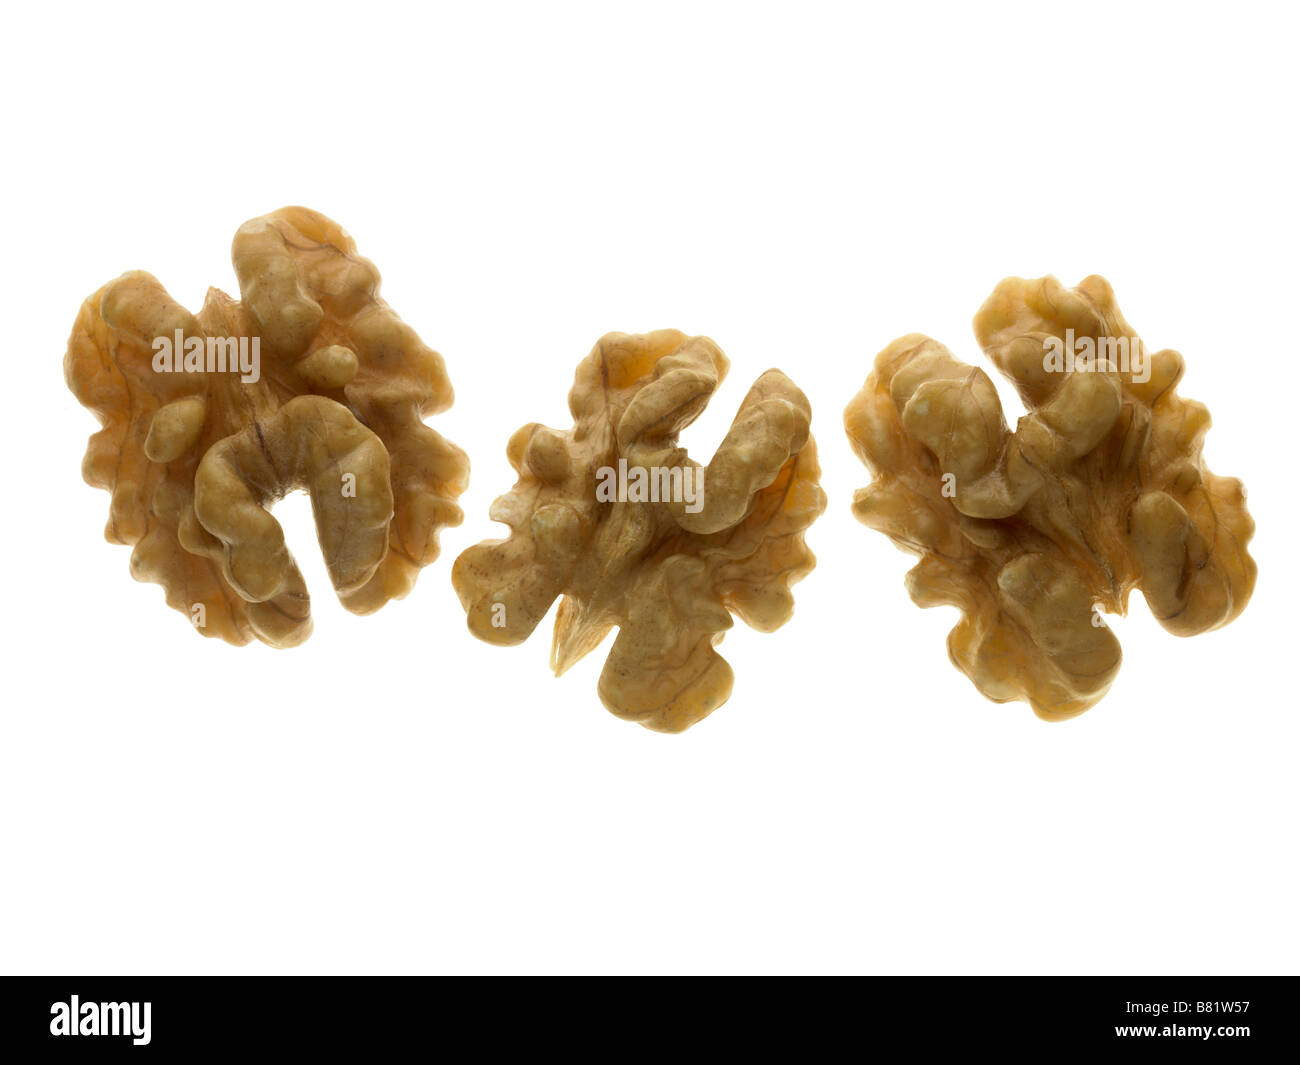 walnut halves - Stock Image